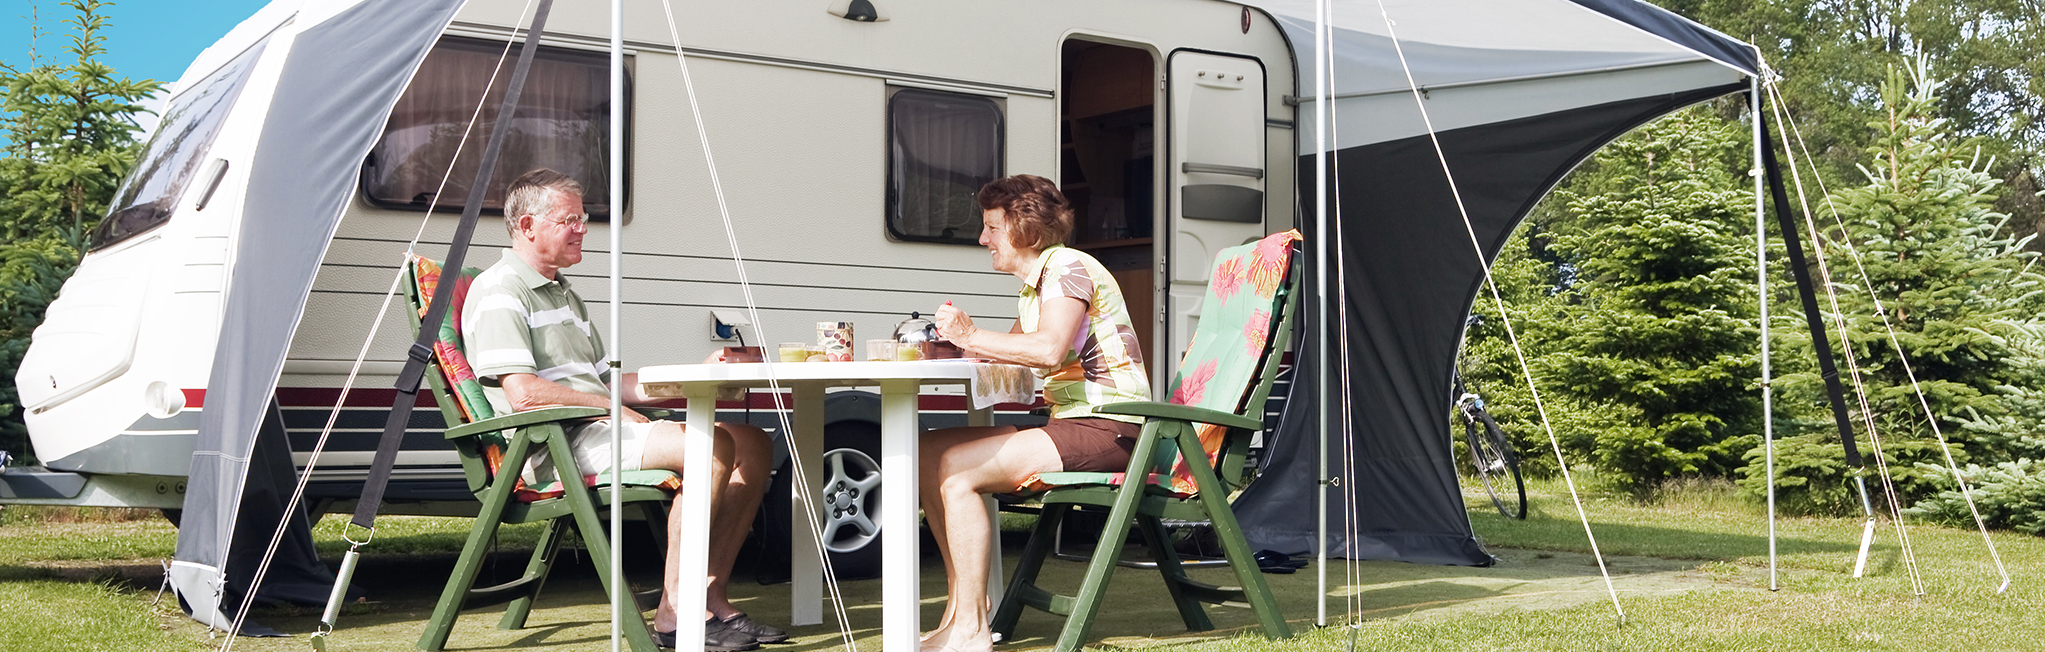 Stormskrue til telt, camping og pavillion